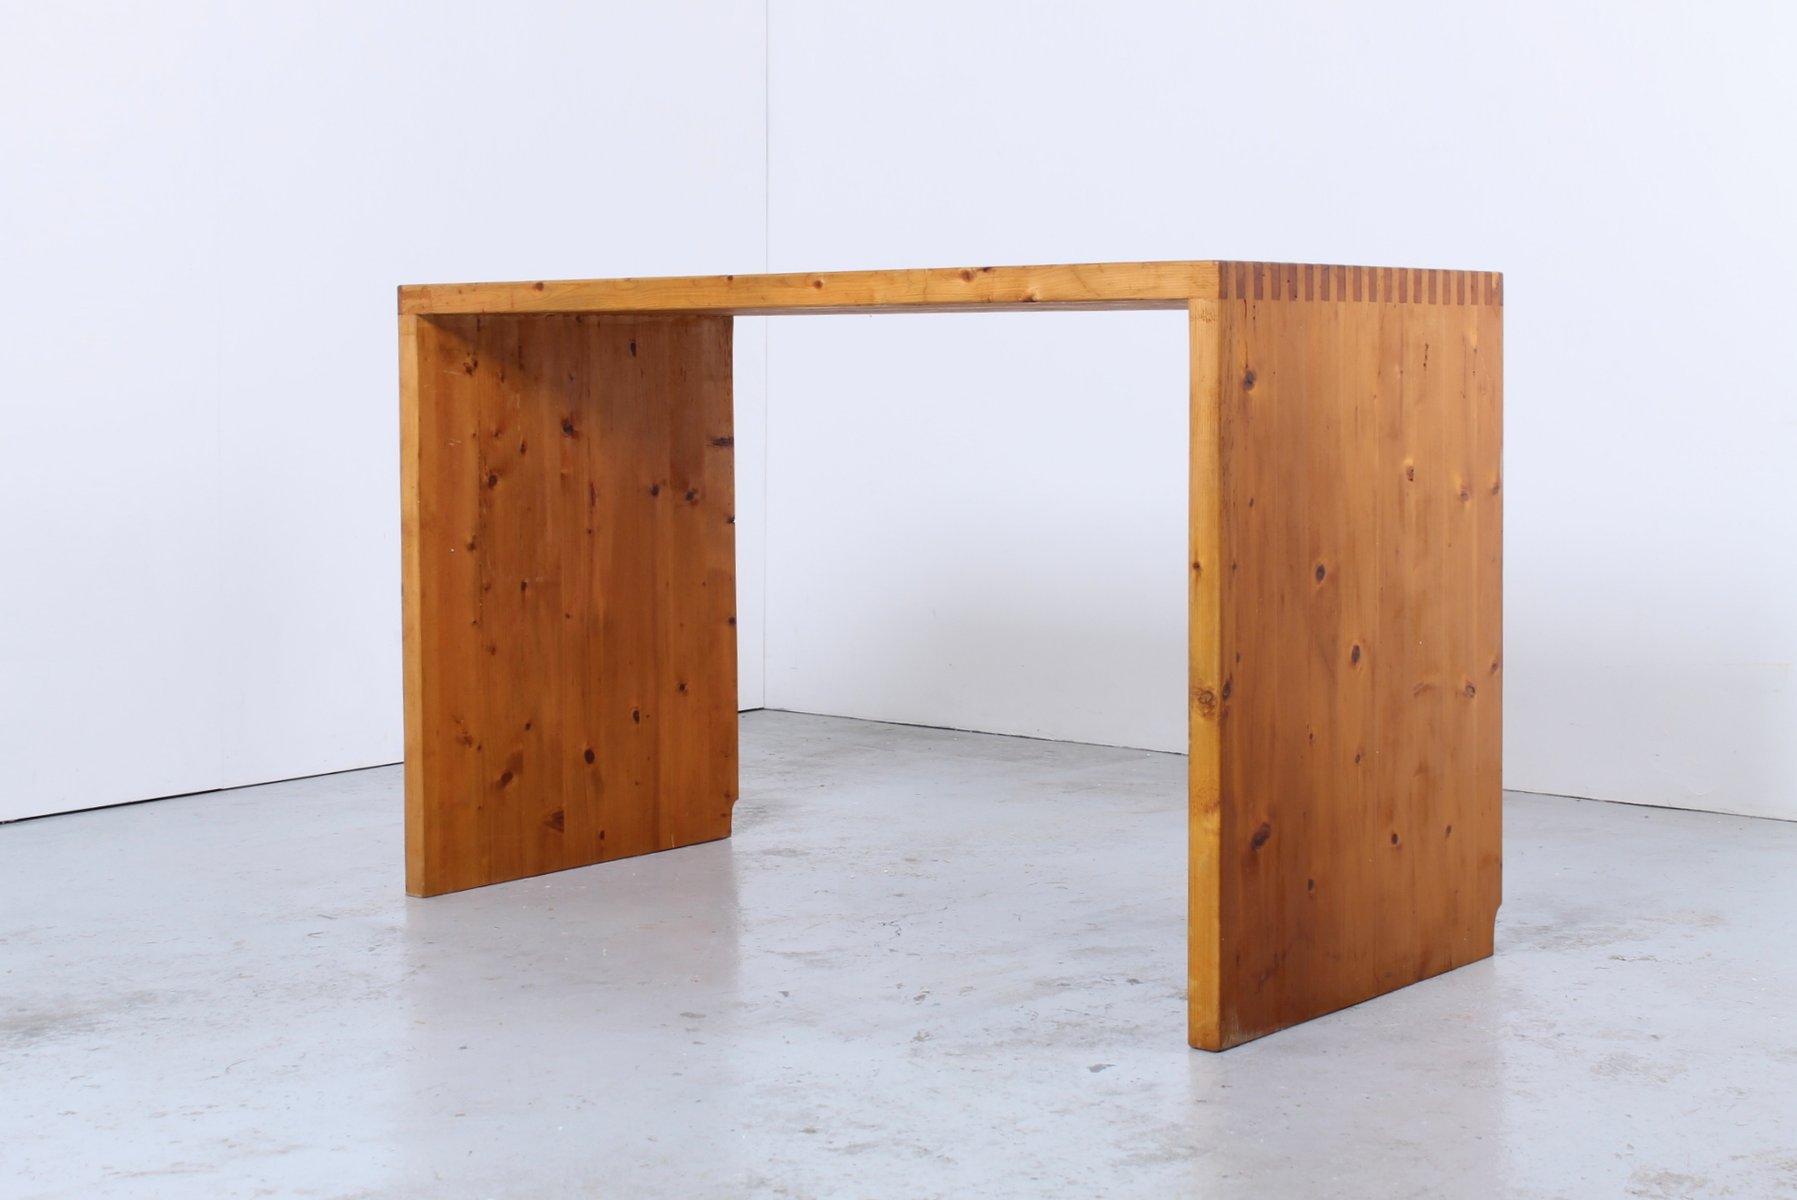 Mid Century Solid Pine Desk By Ate Van Apeldoorn For Houtwerk Hattem At Pamono